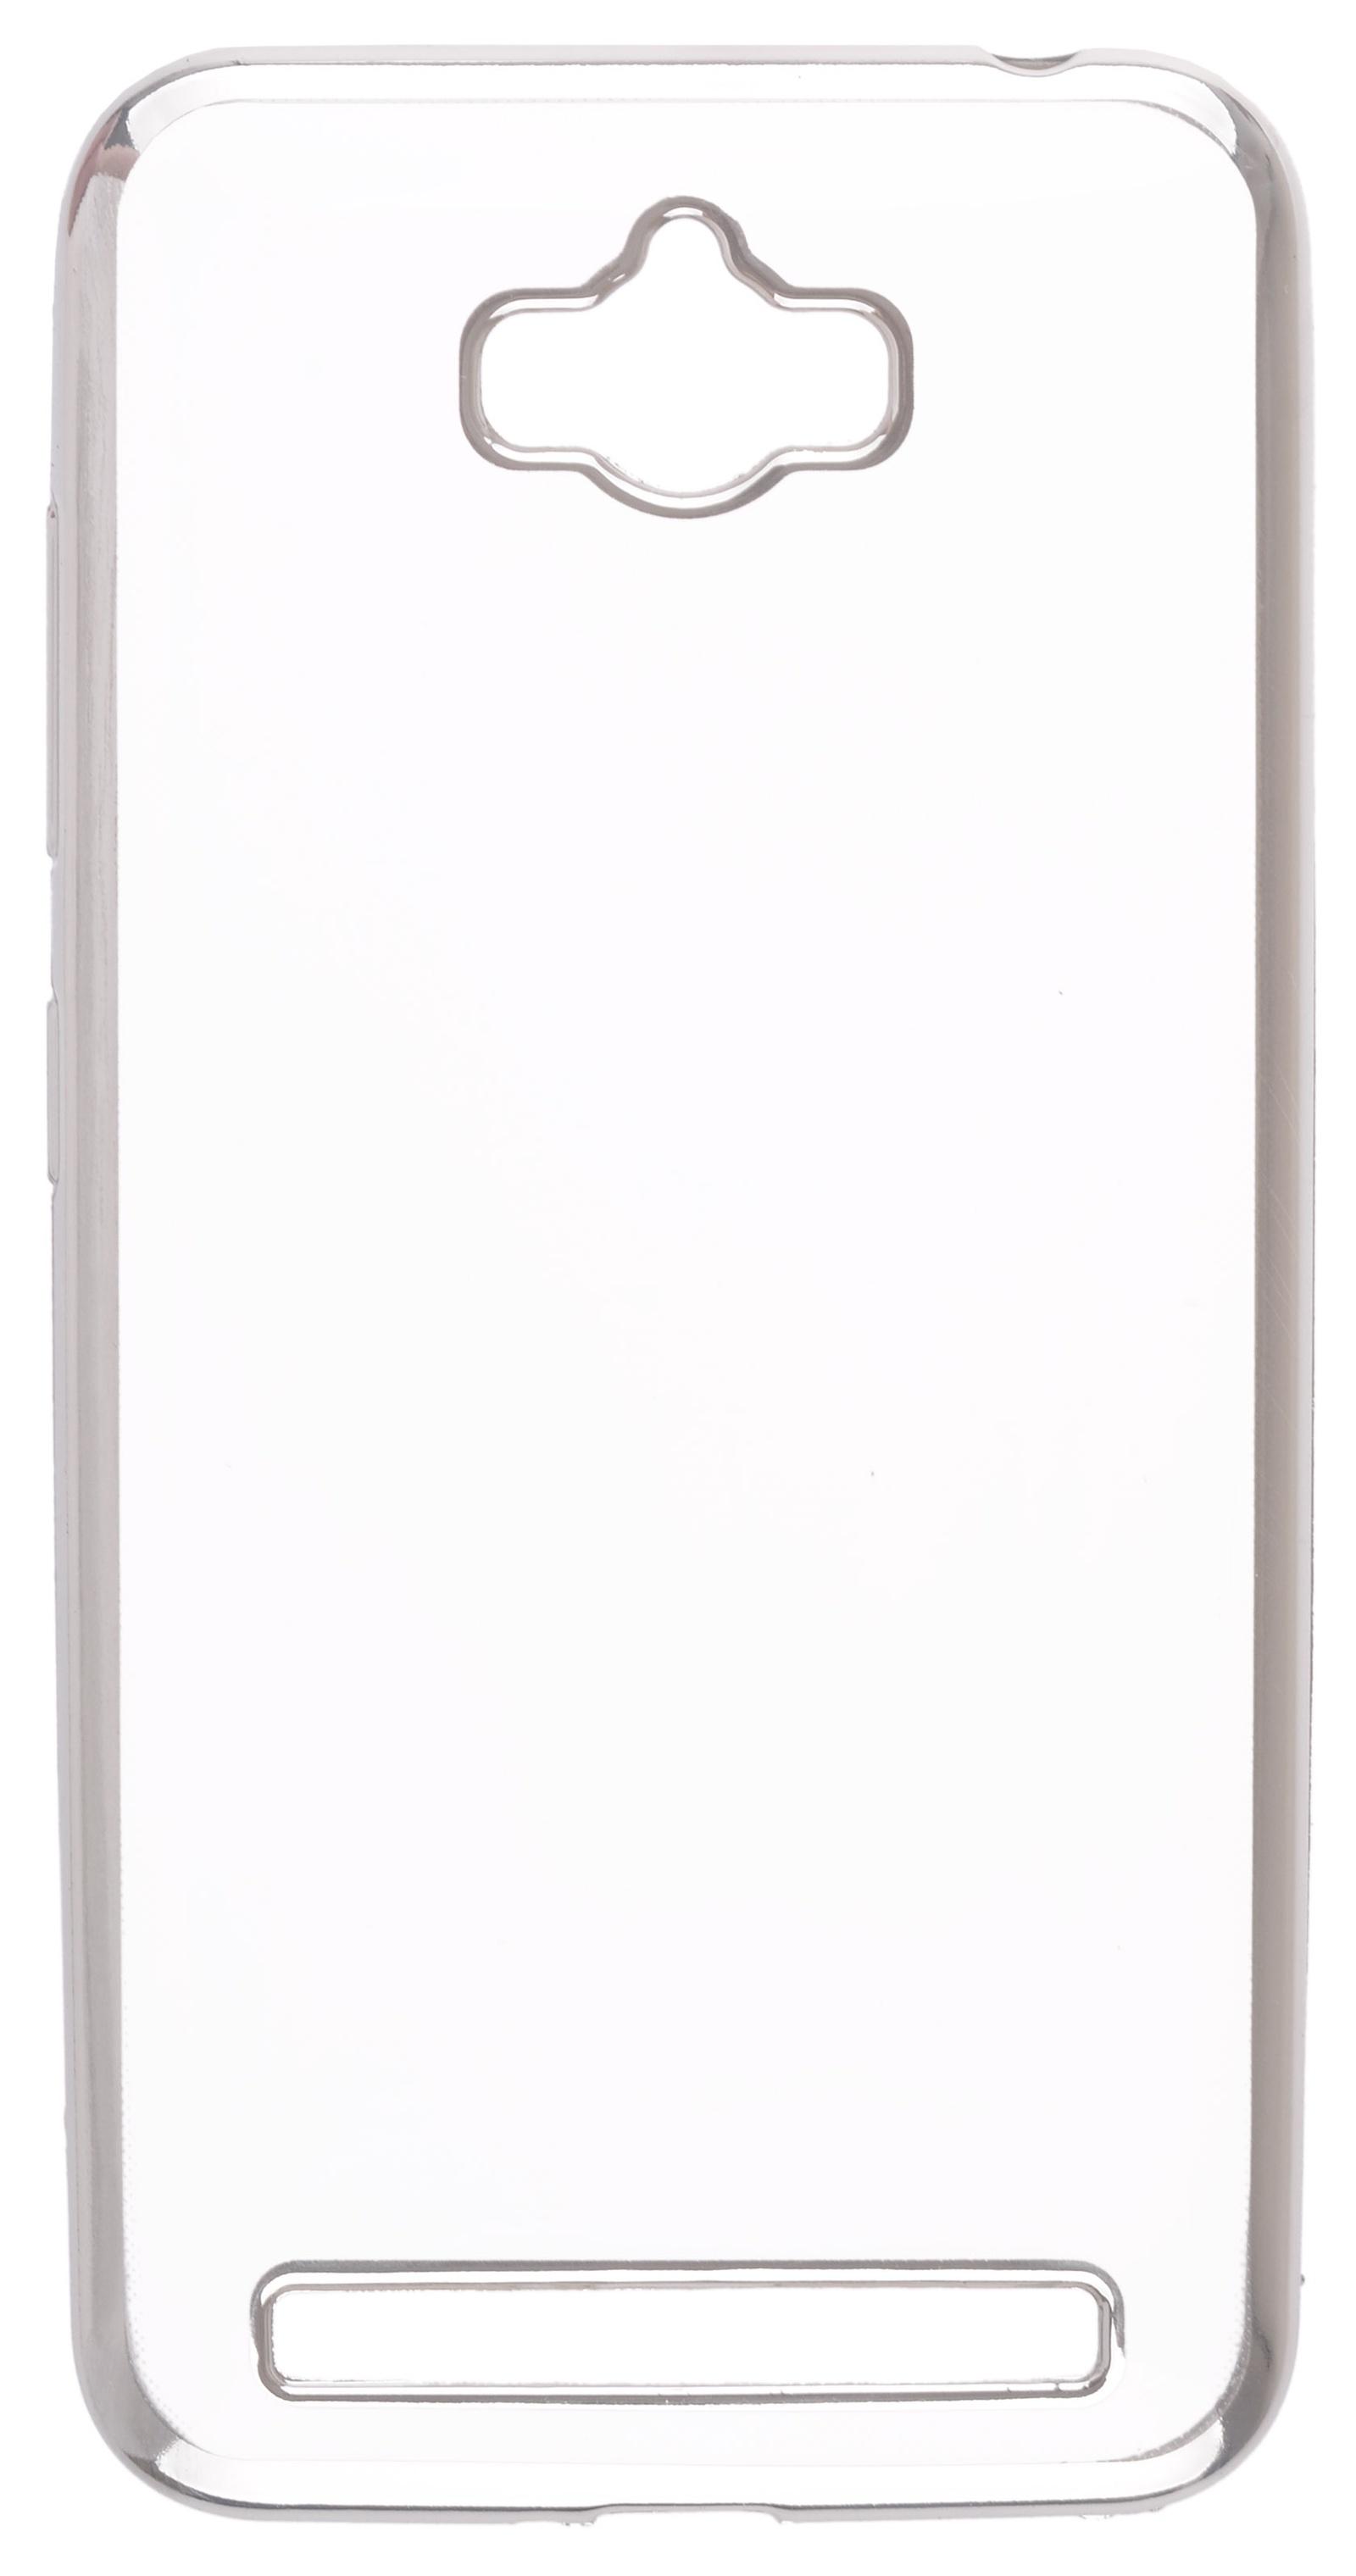 Чехол для сотового телефона skinBOX Silicone chrome border, 4660041407969, серебристый цена